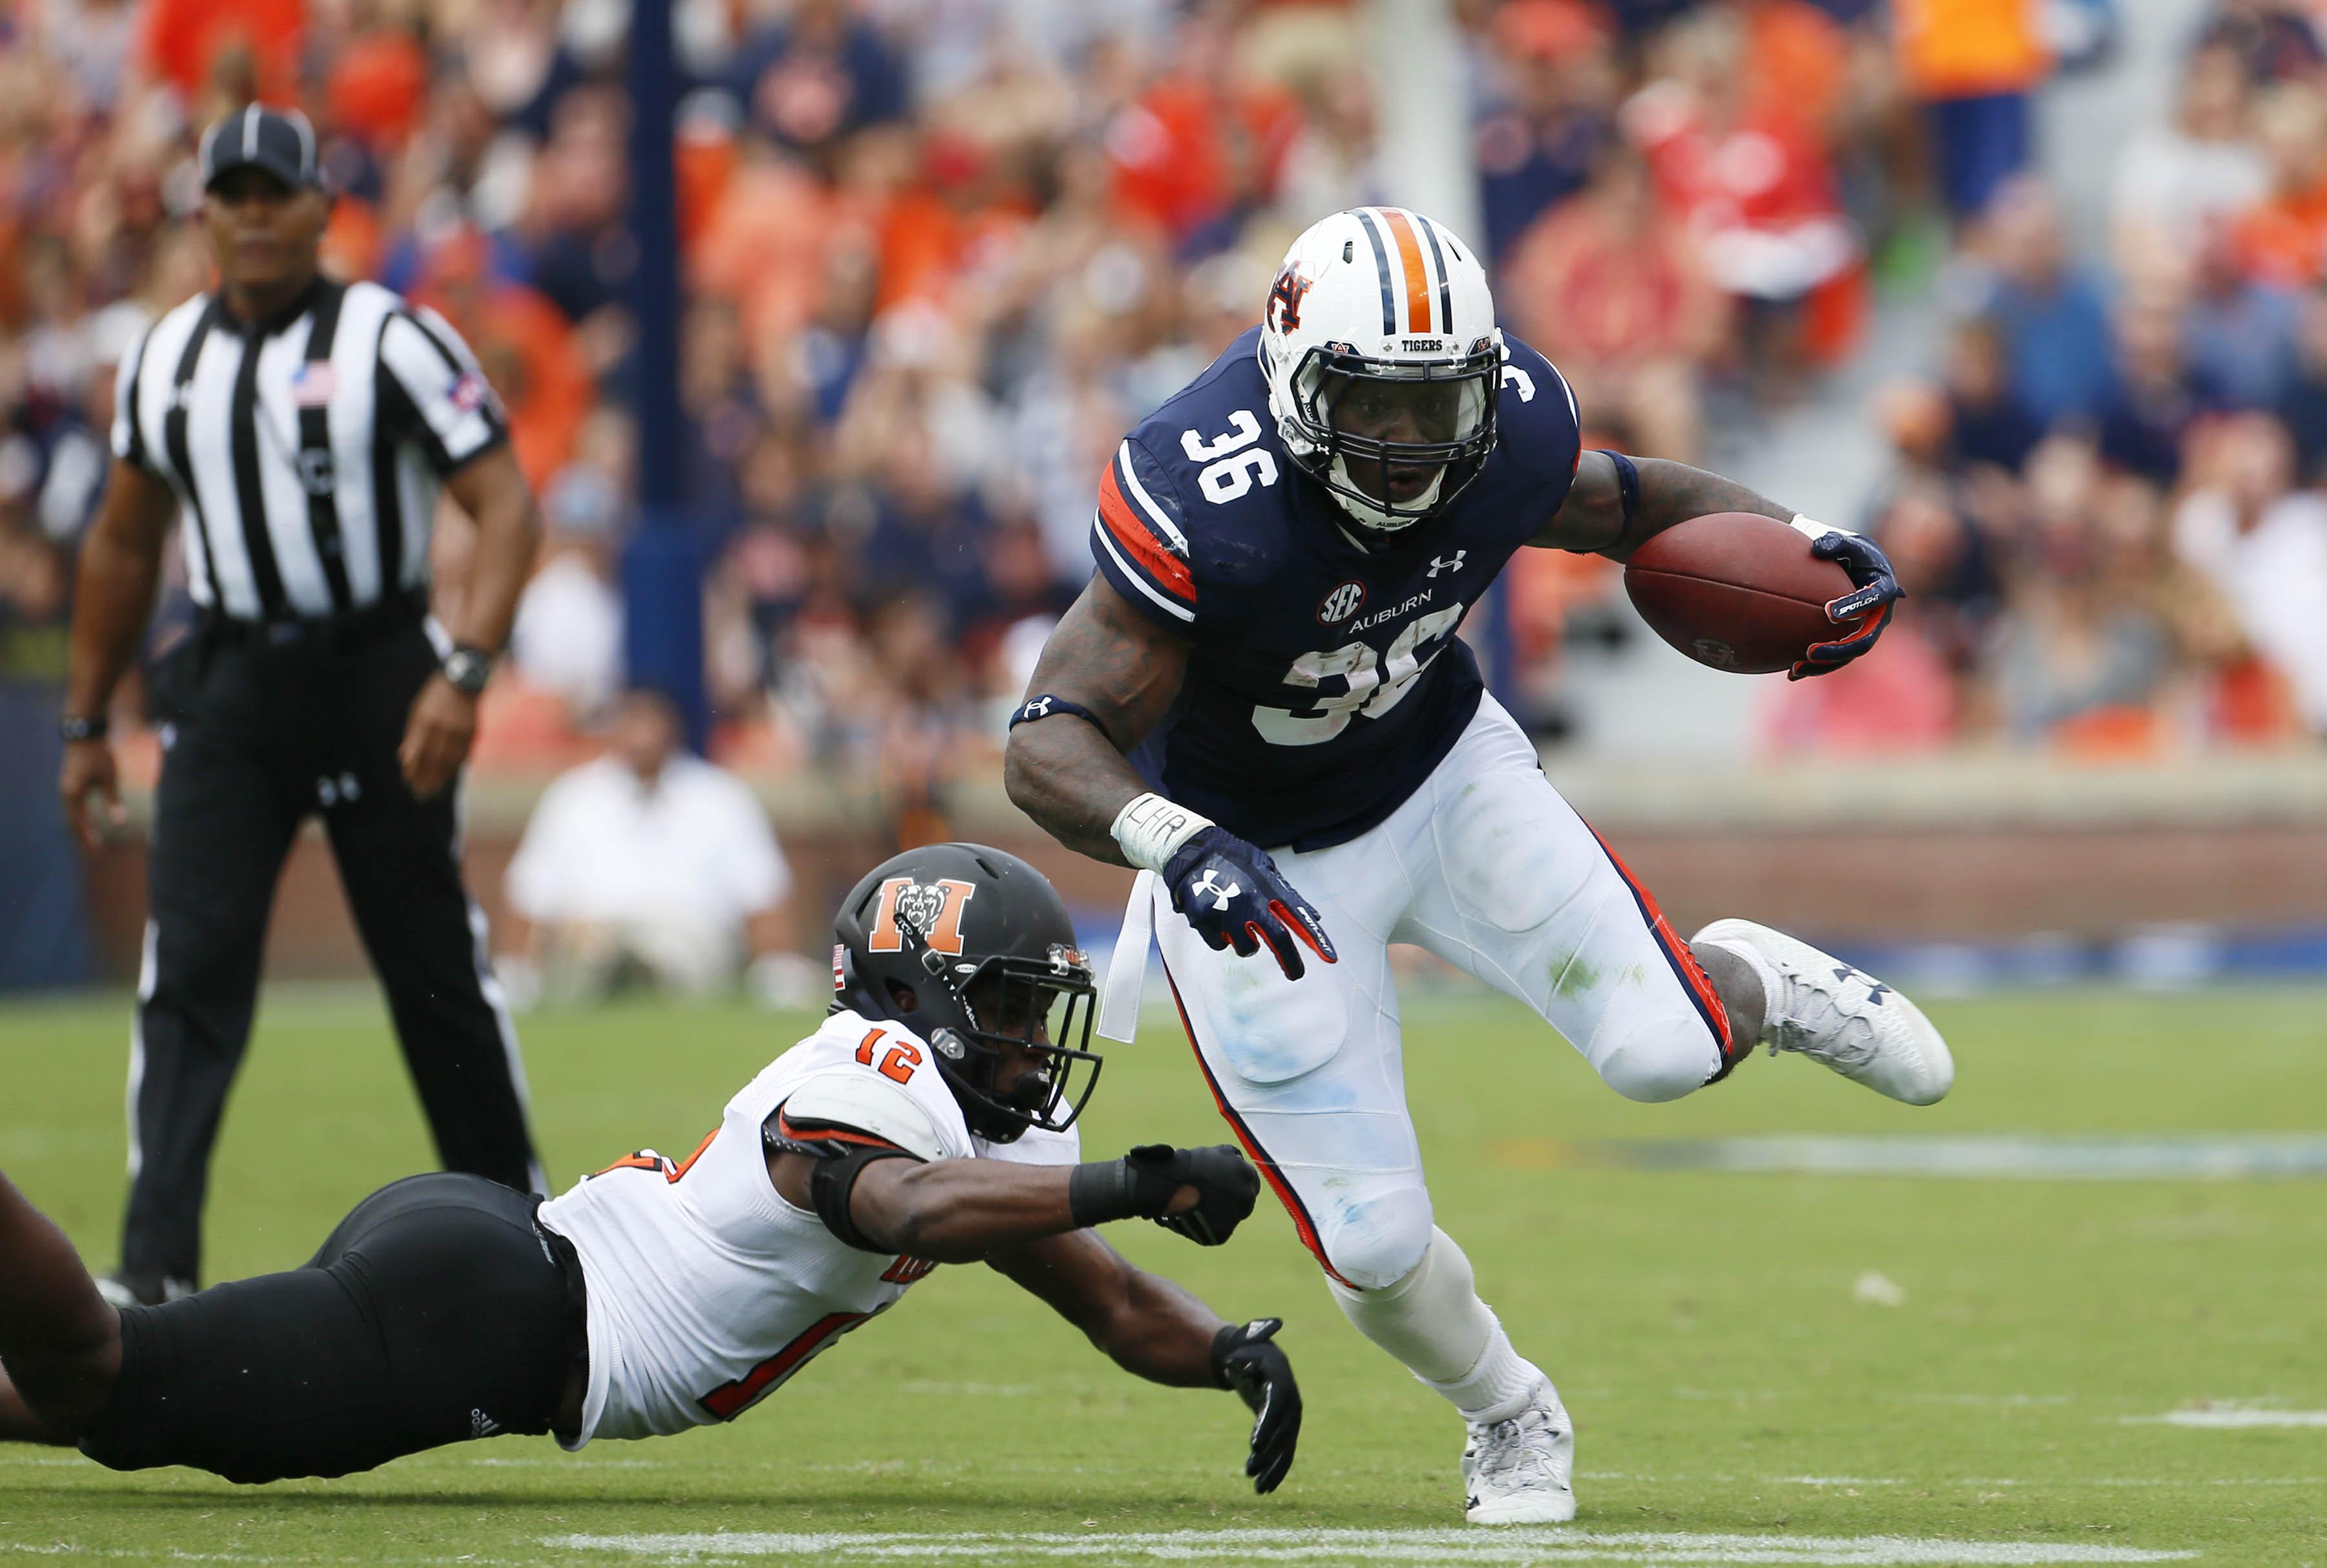 NCAA Football: Mercer at Auburn